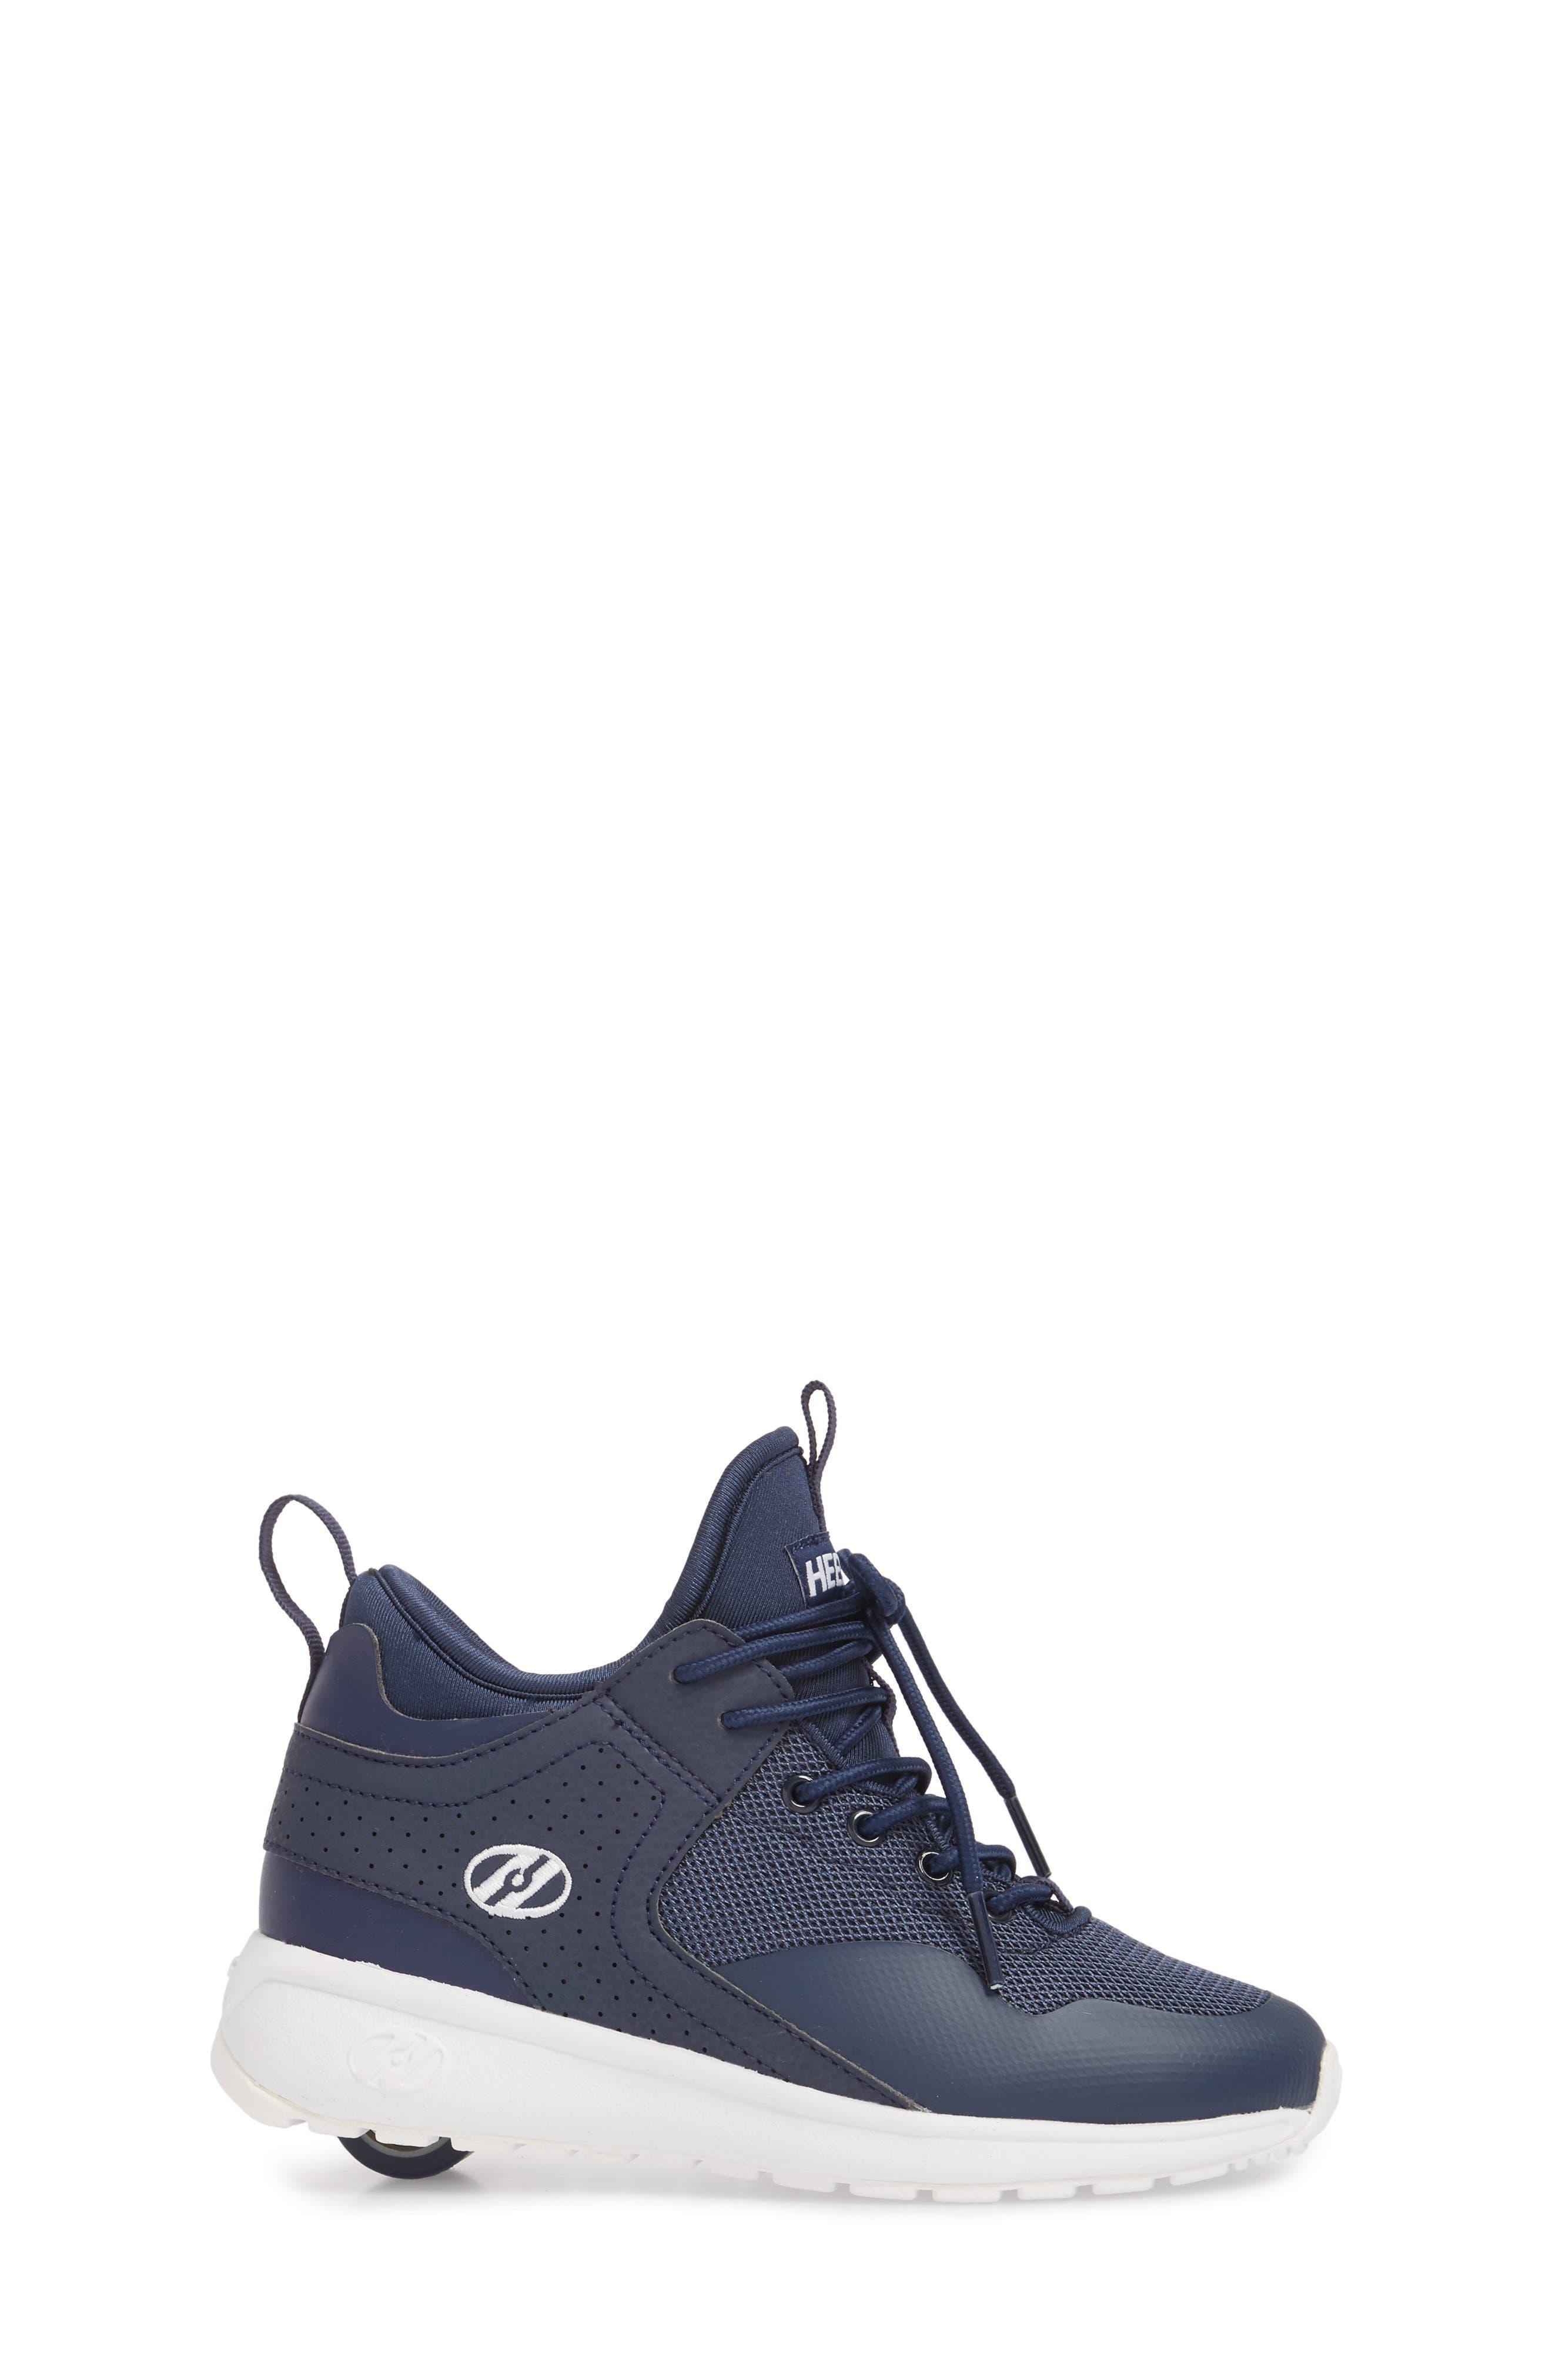 Piper Sneaker,                             Alternate thumbnail 3, color,                             411